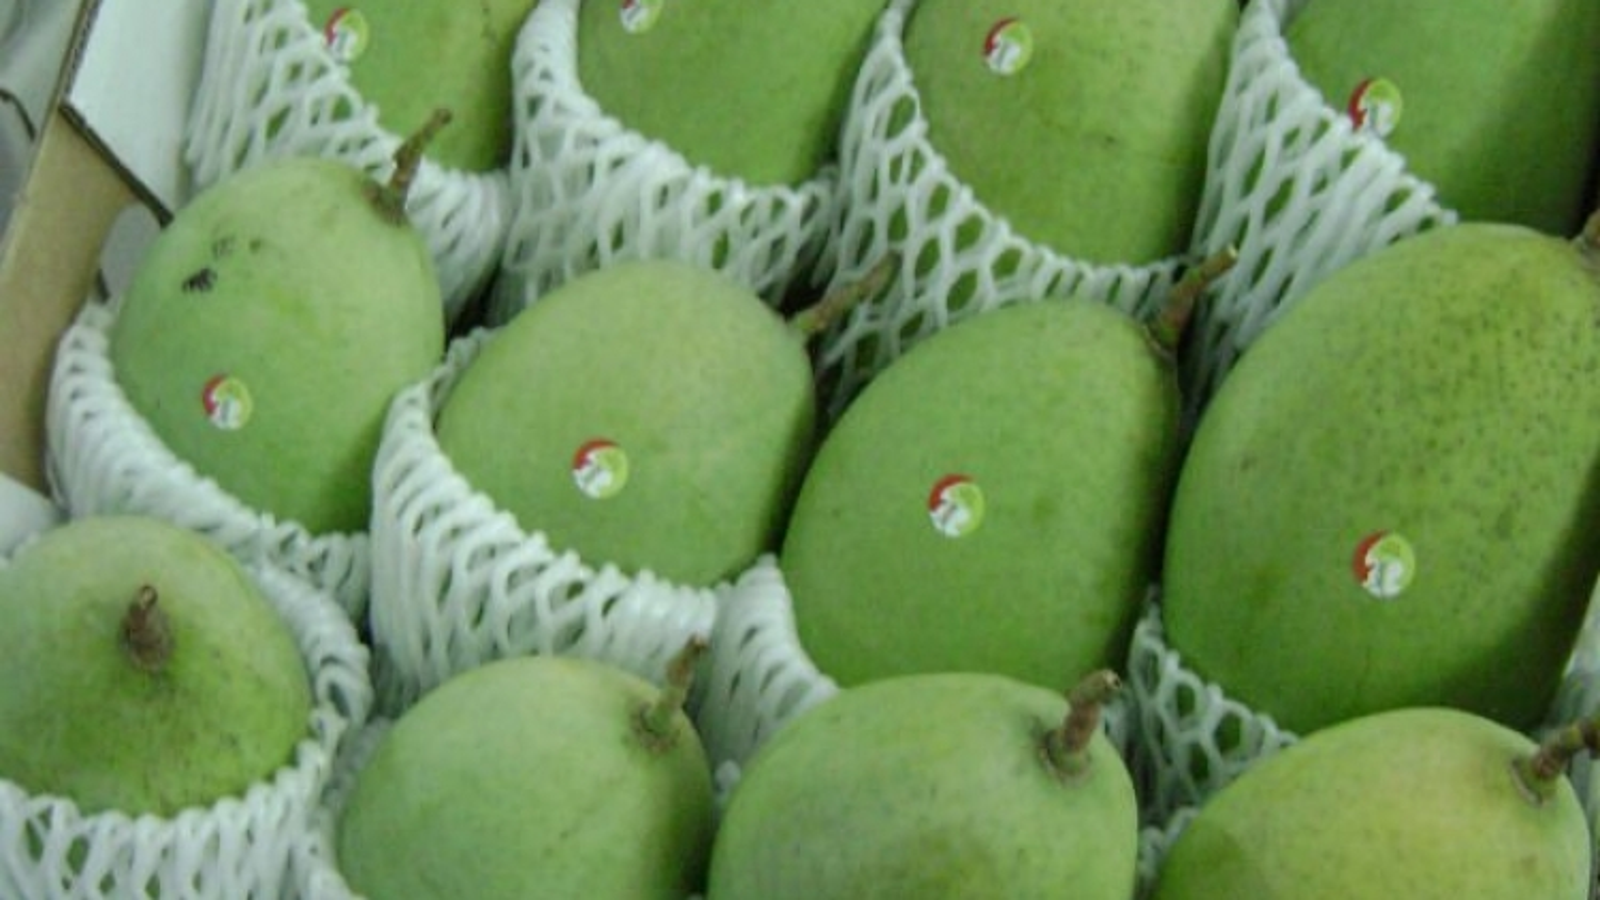 Mango shipments to Australia on the upswing